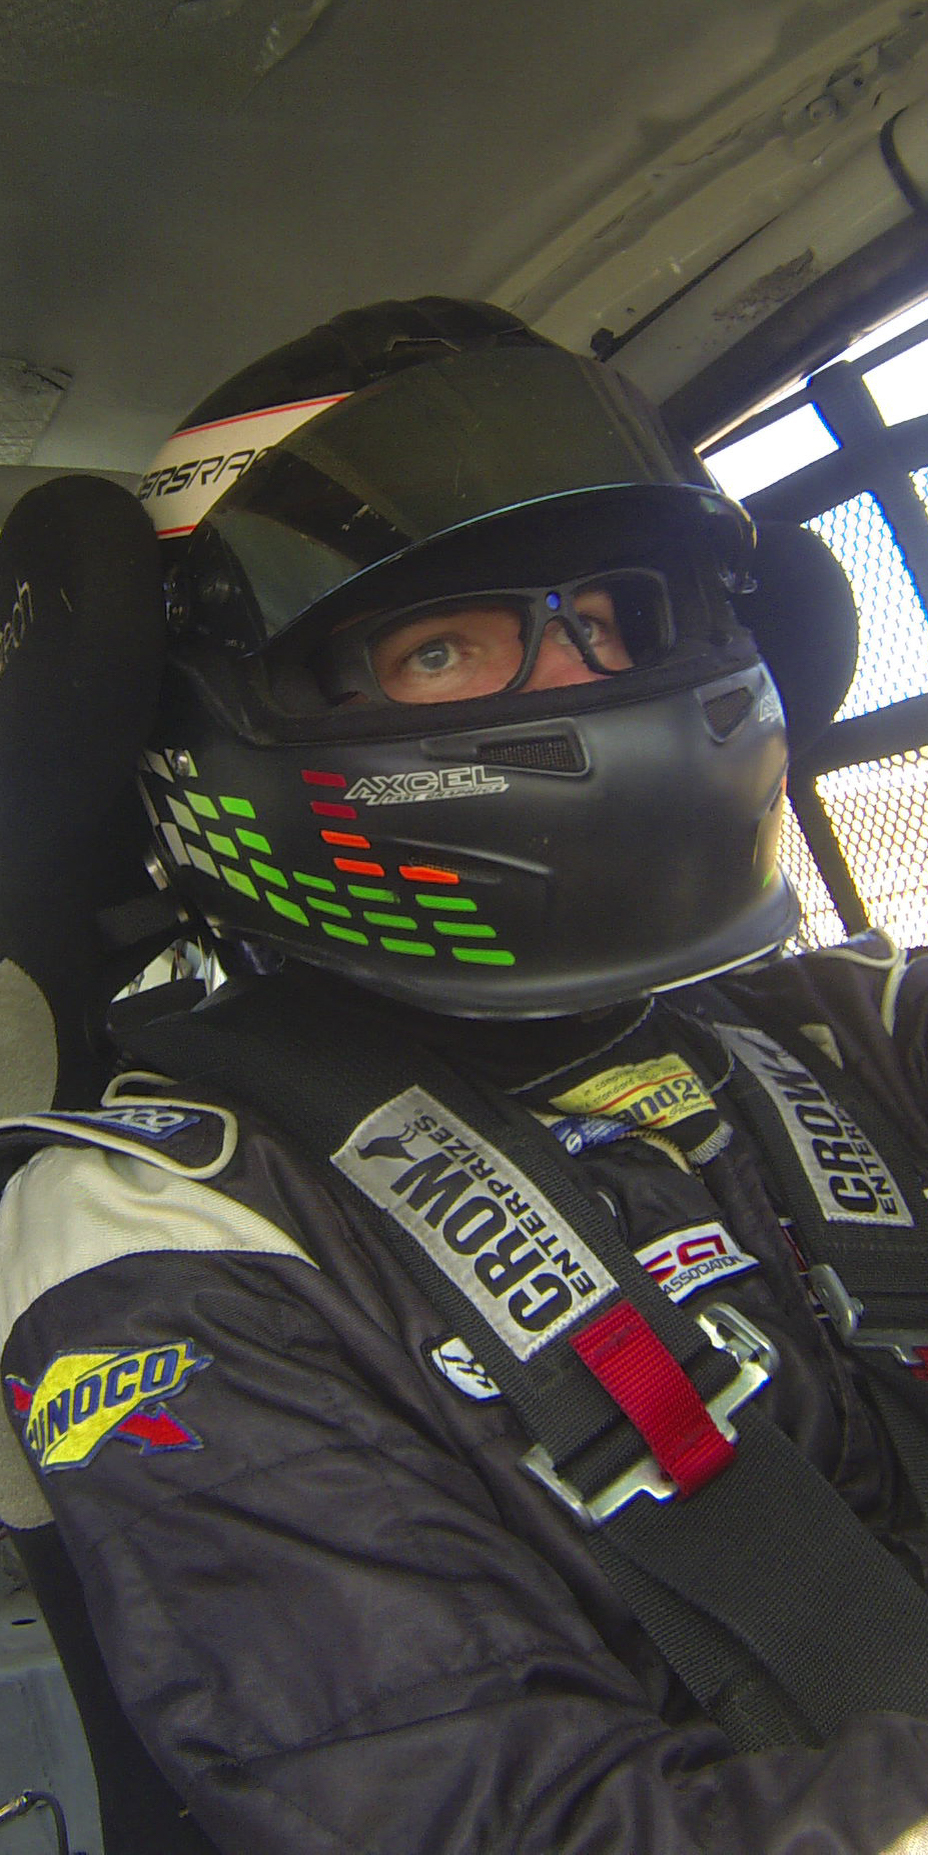 2015-08_RACE_Laguna_USTCC_DRIVER_GOPR0154.jpg